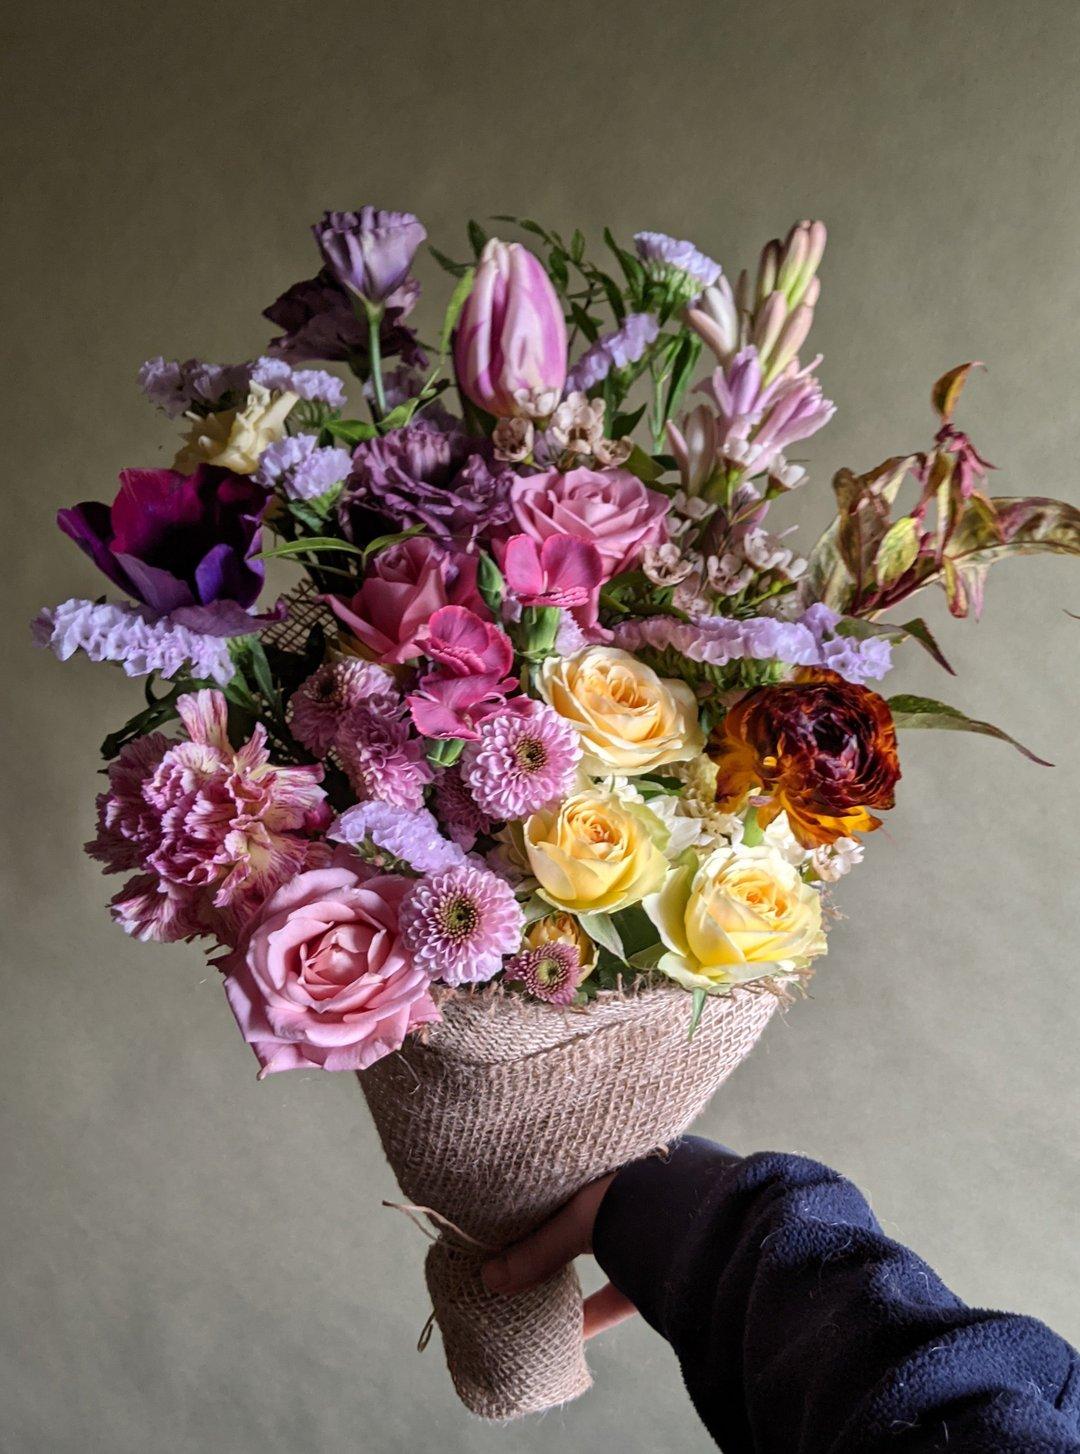 colourful sustainable seasonal flower bouquet